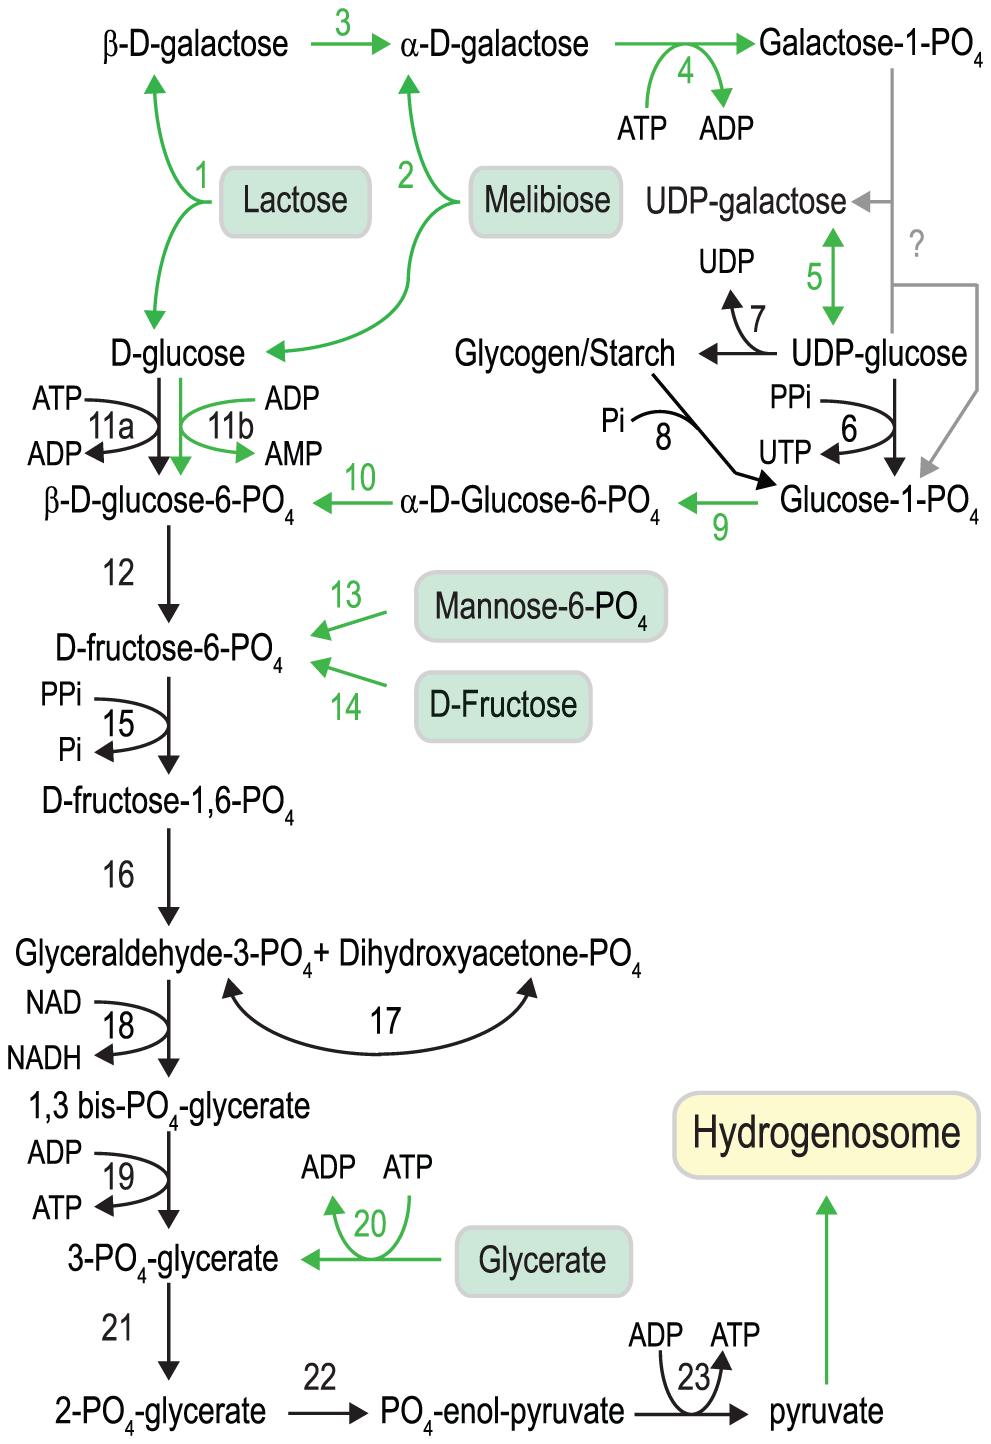 Carbohydrate metabolism in <i>S. salmonicida</i>.